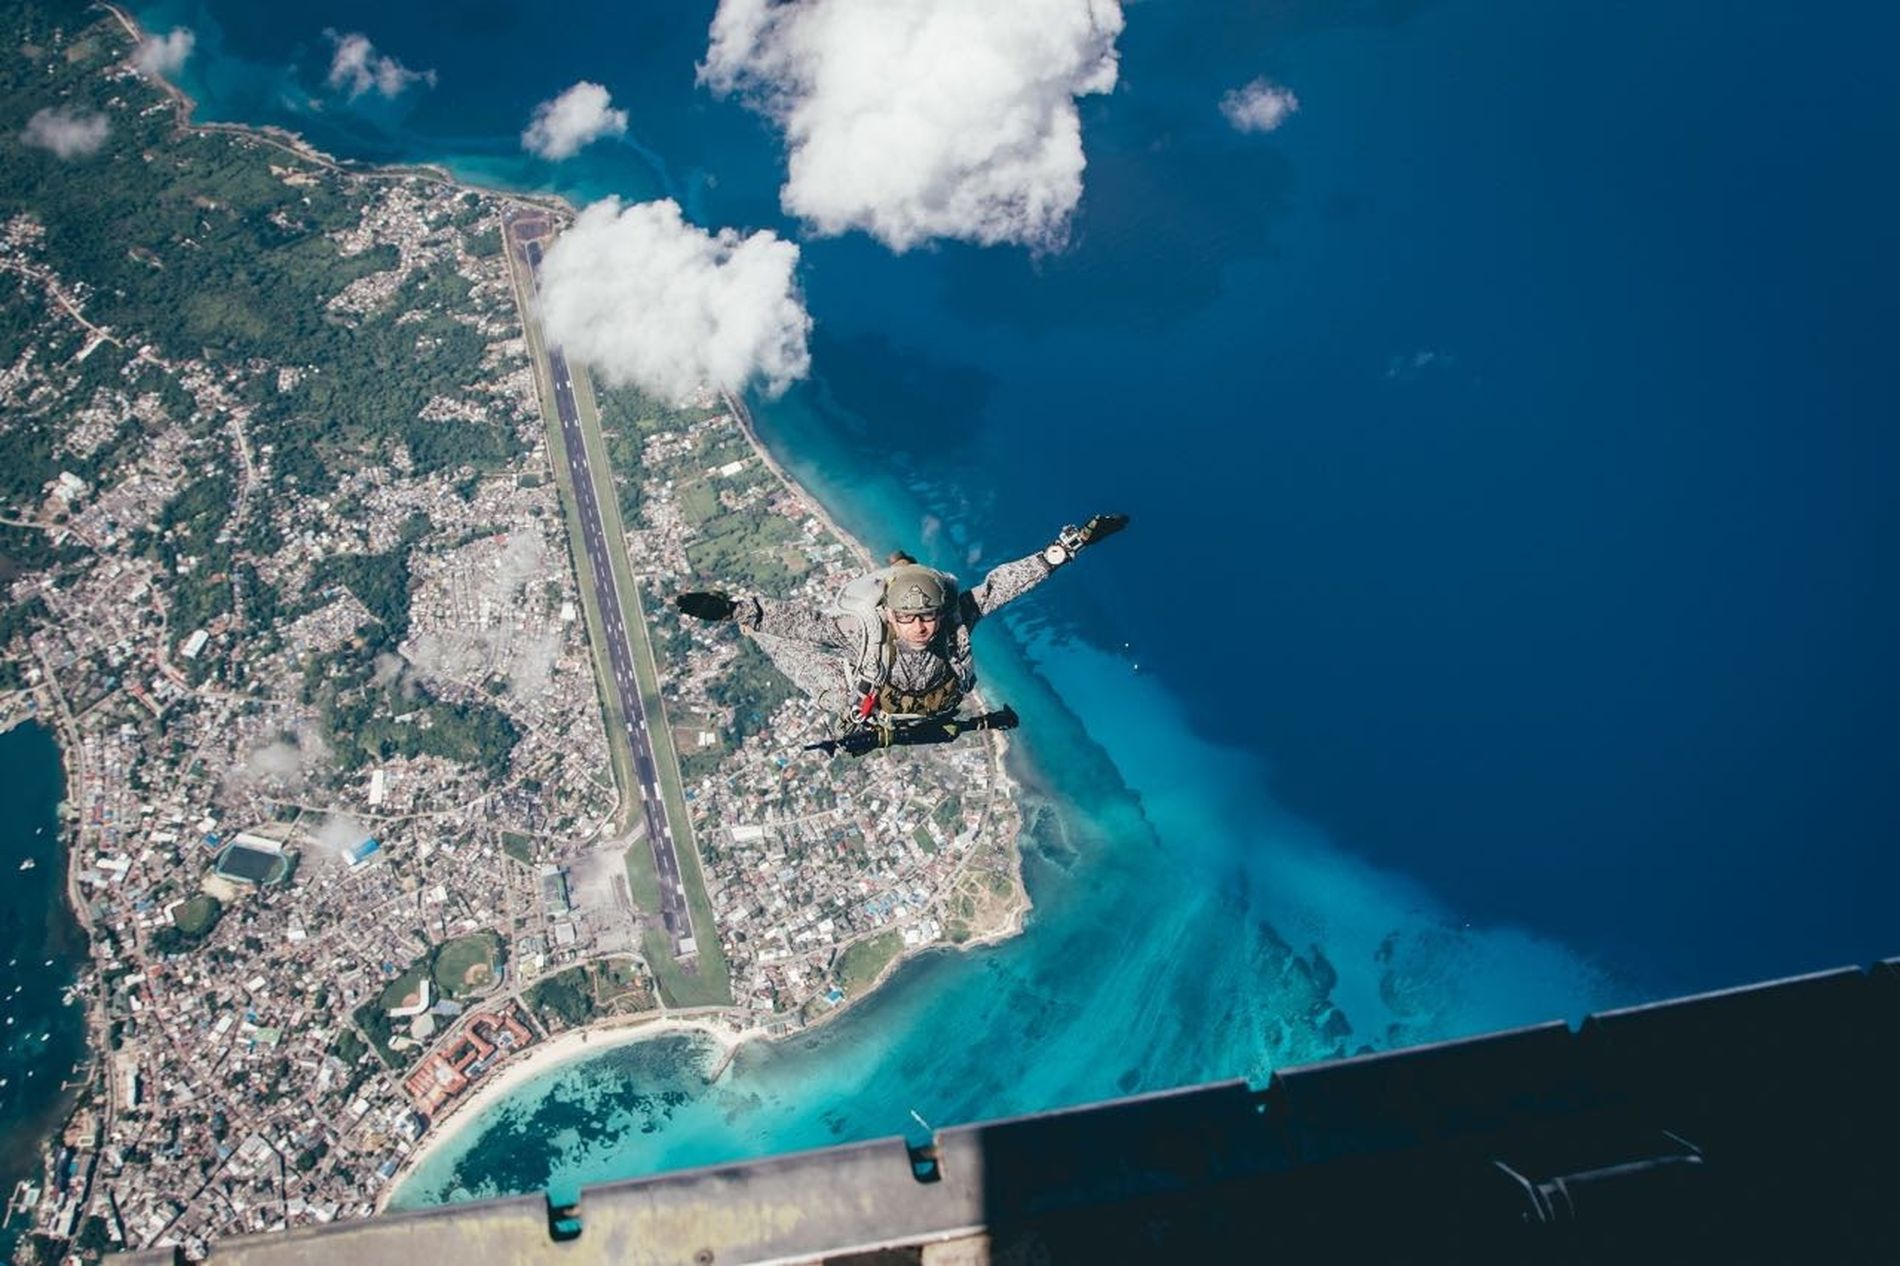 Parachute in san andres islas. Sea Cloud - Sky Paragliding Parachute Sky Day Paradise Island Paracaidismo Military Uniform Military Style MilitaryPhotography Military Unit Island Adventure Islandphotography Parachutejump Parachutte Outdoors